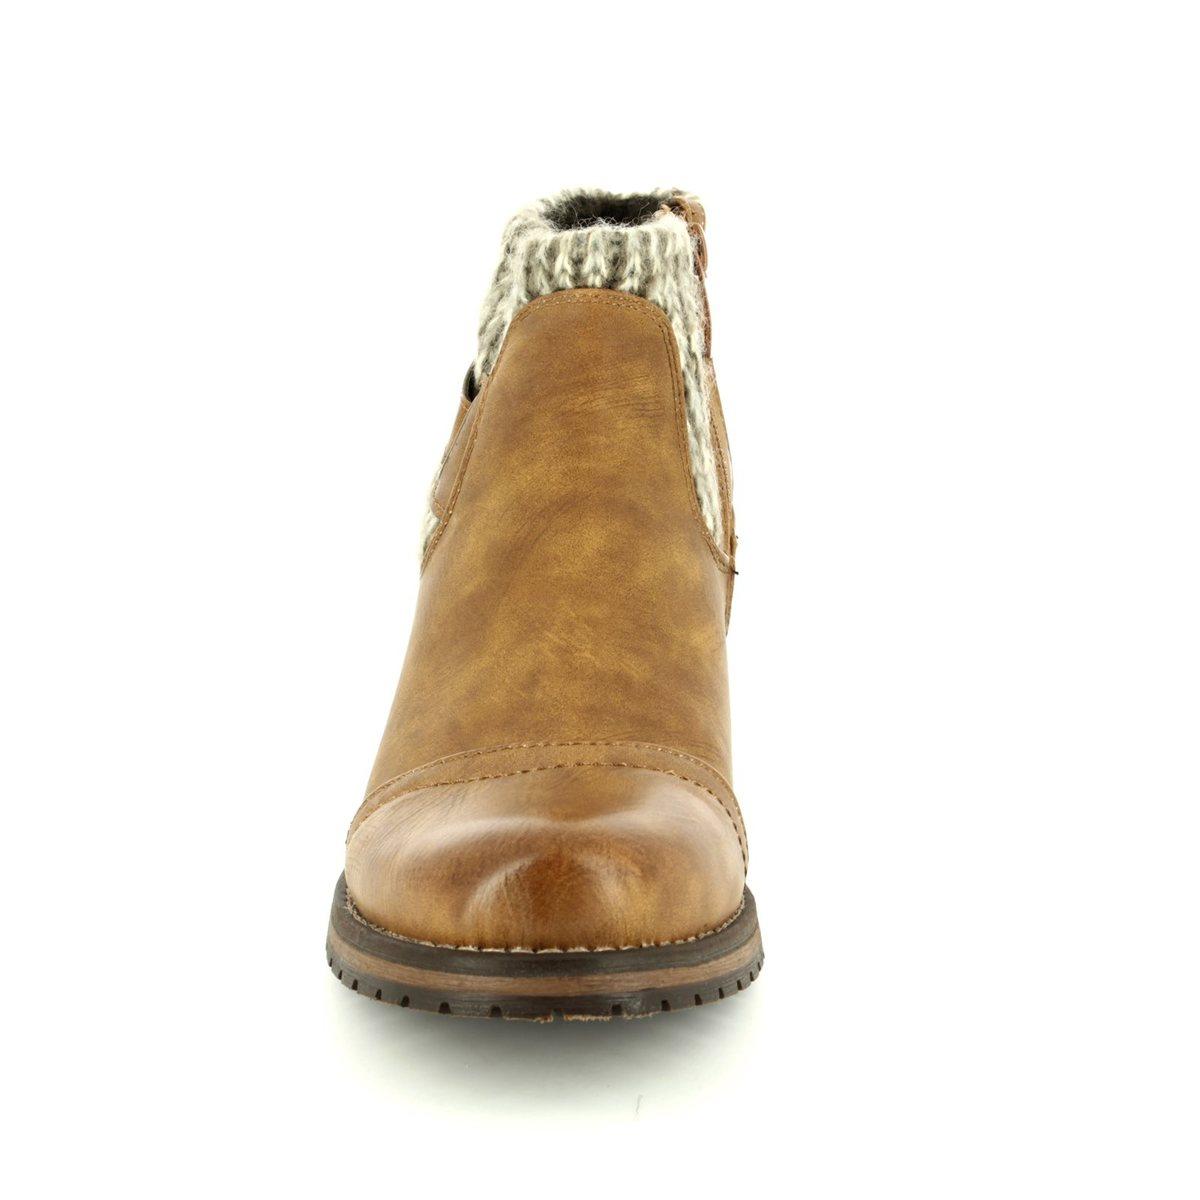 030e61162 Lotus Ankle Boots - Tan - 40425/10 AYLA